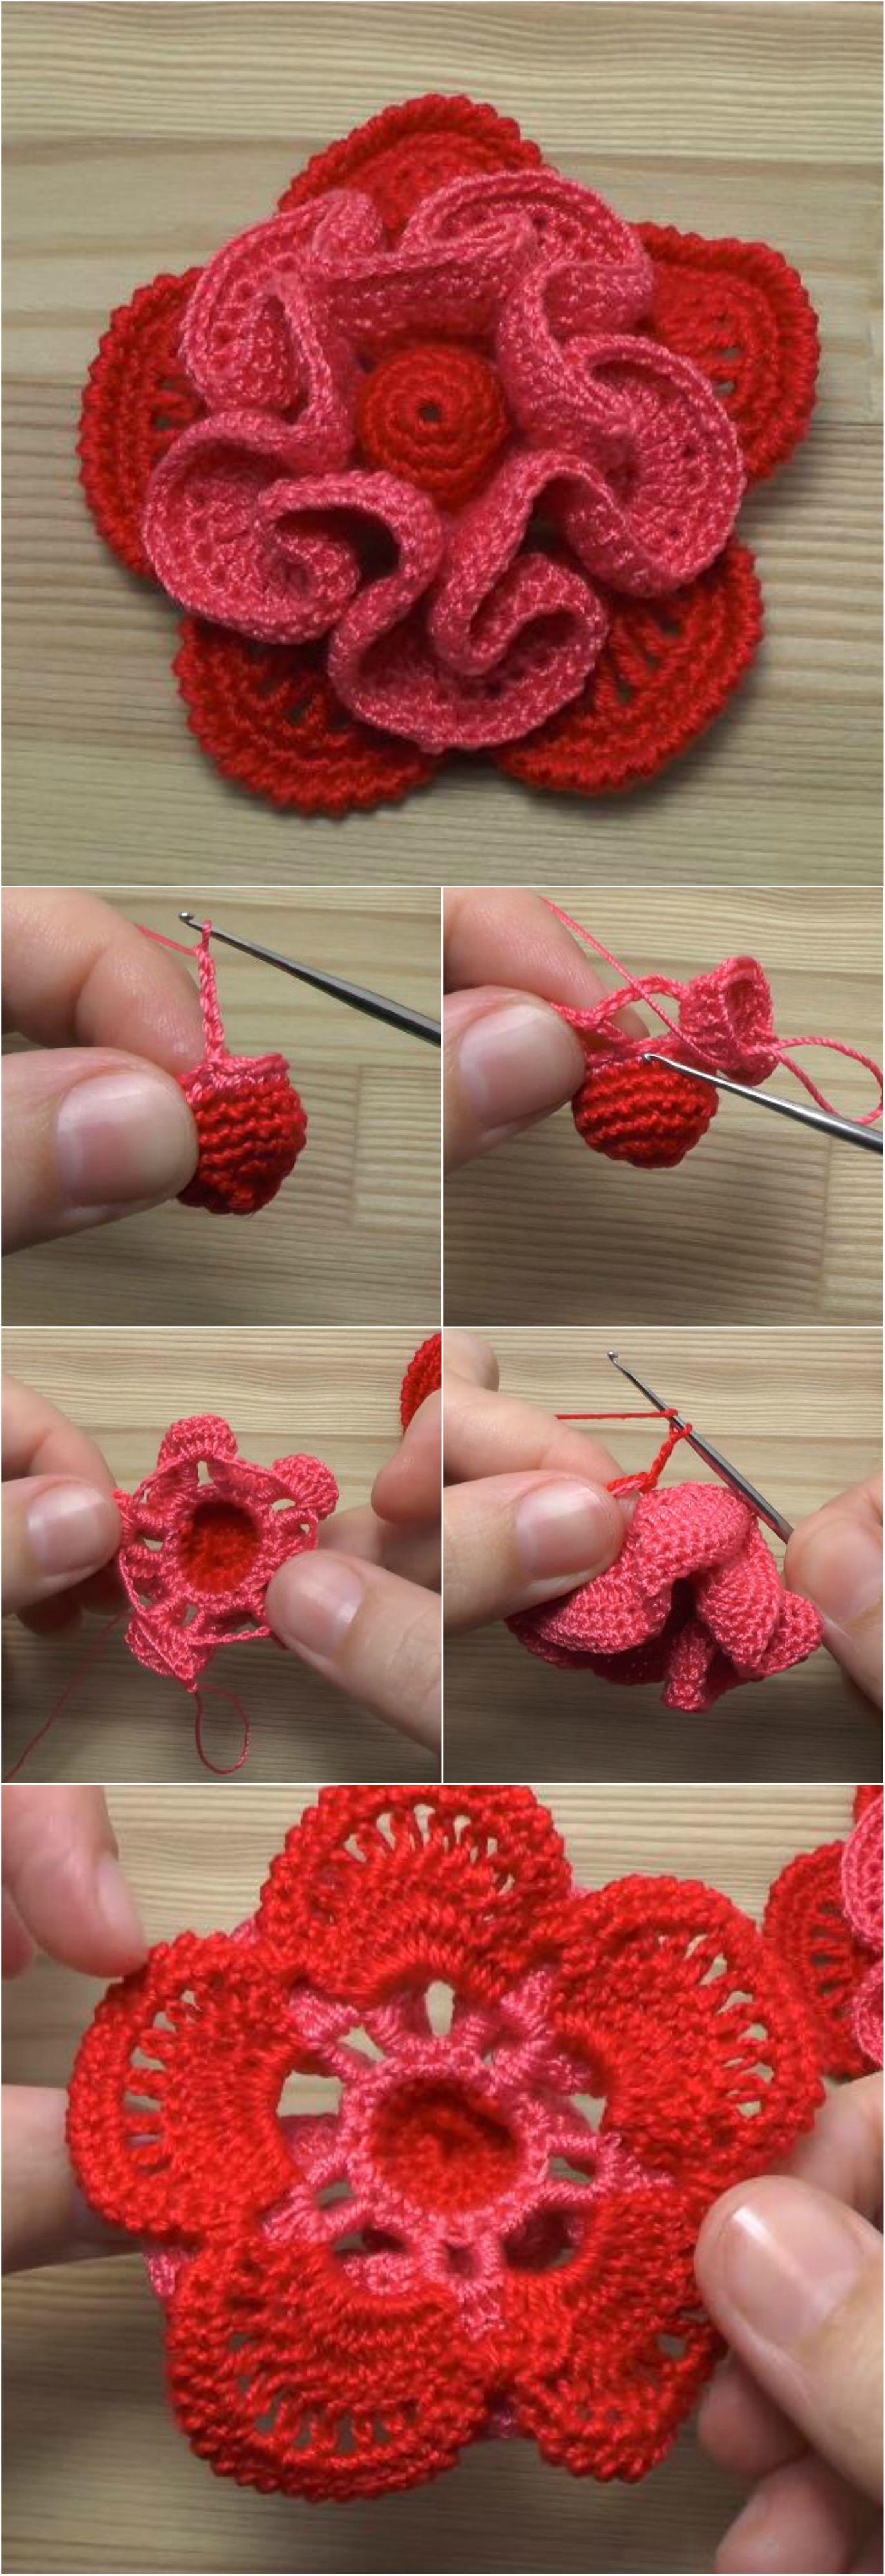 crochet decorative flower pretty ideas. Black Bedroom Furniture Sets. Home Design Ideas